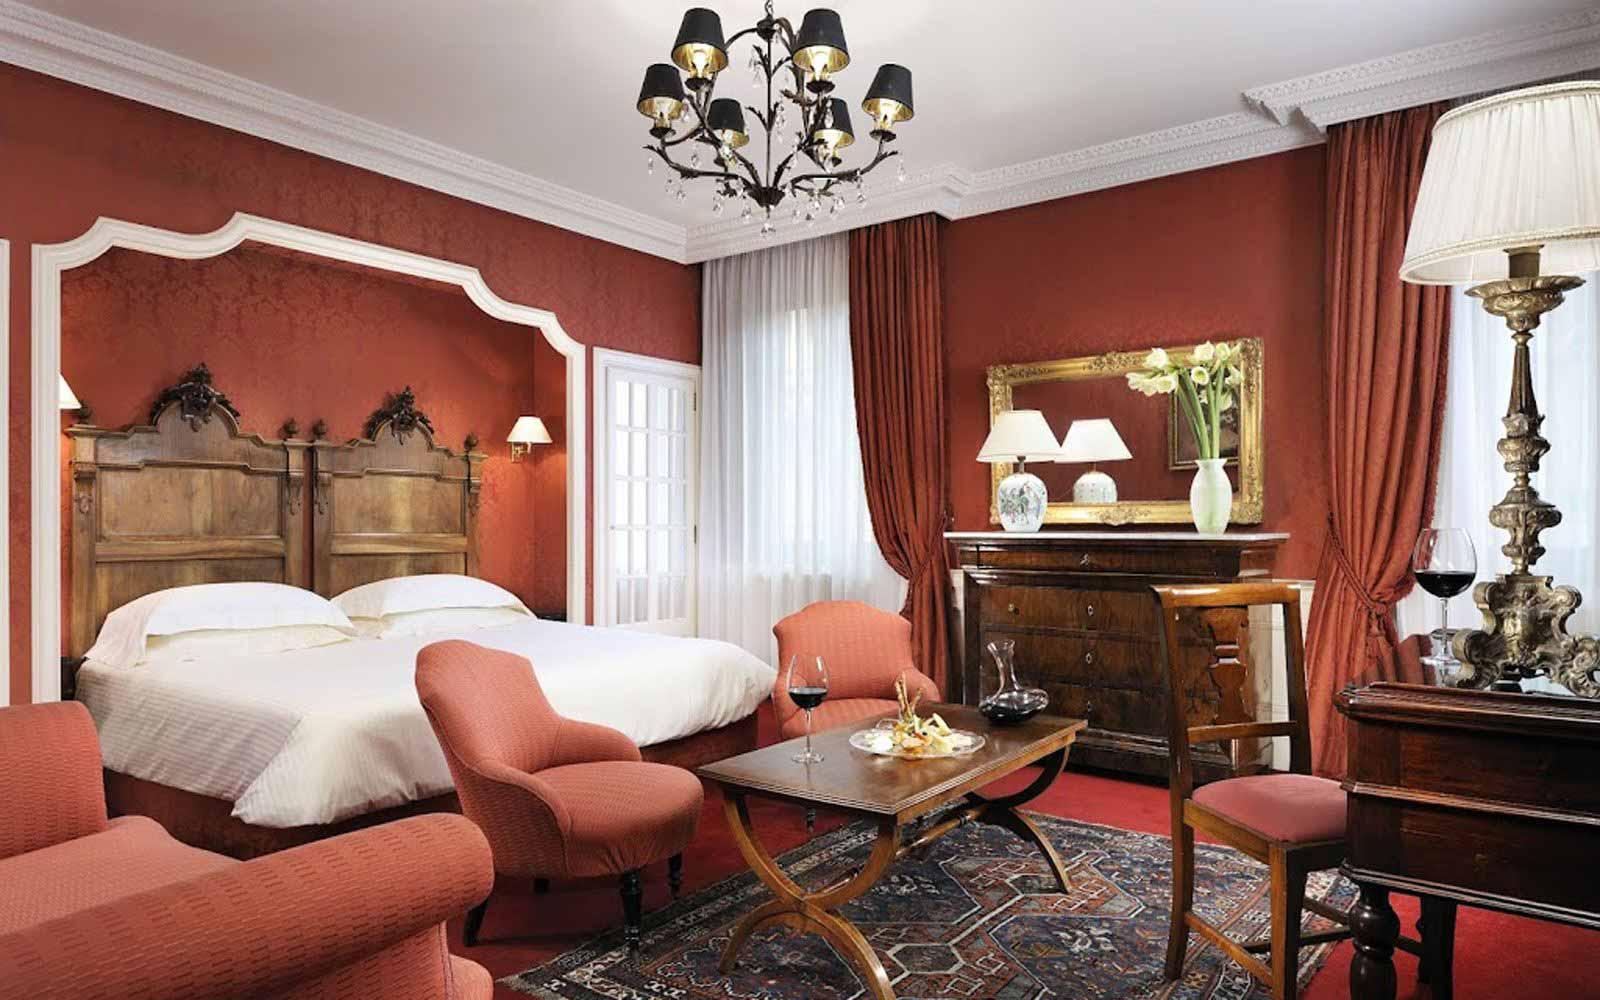 Deluxe double room at Hotel Helvetia & Bristol